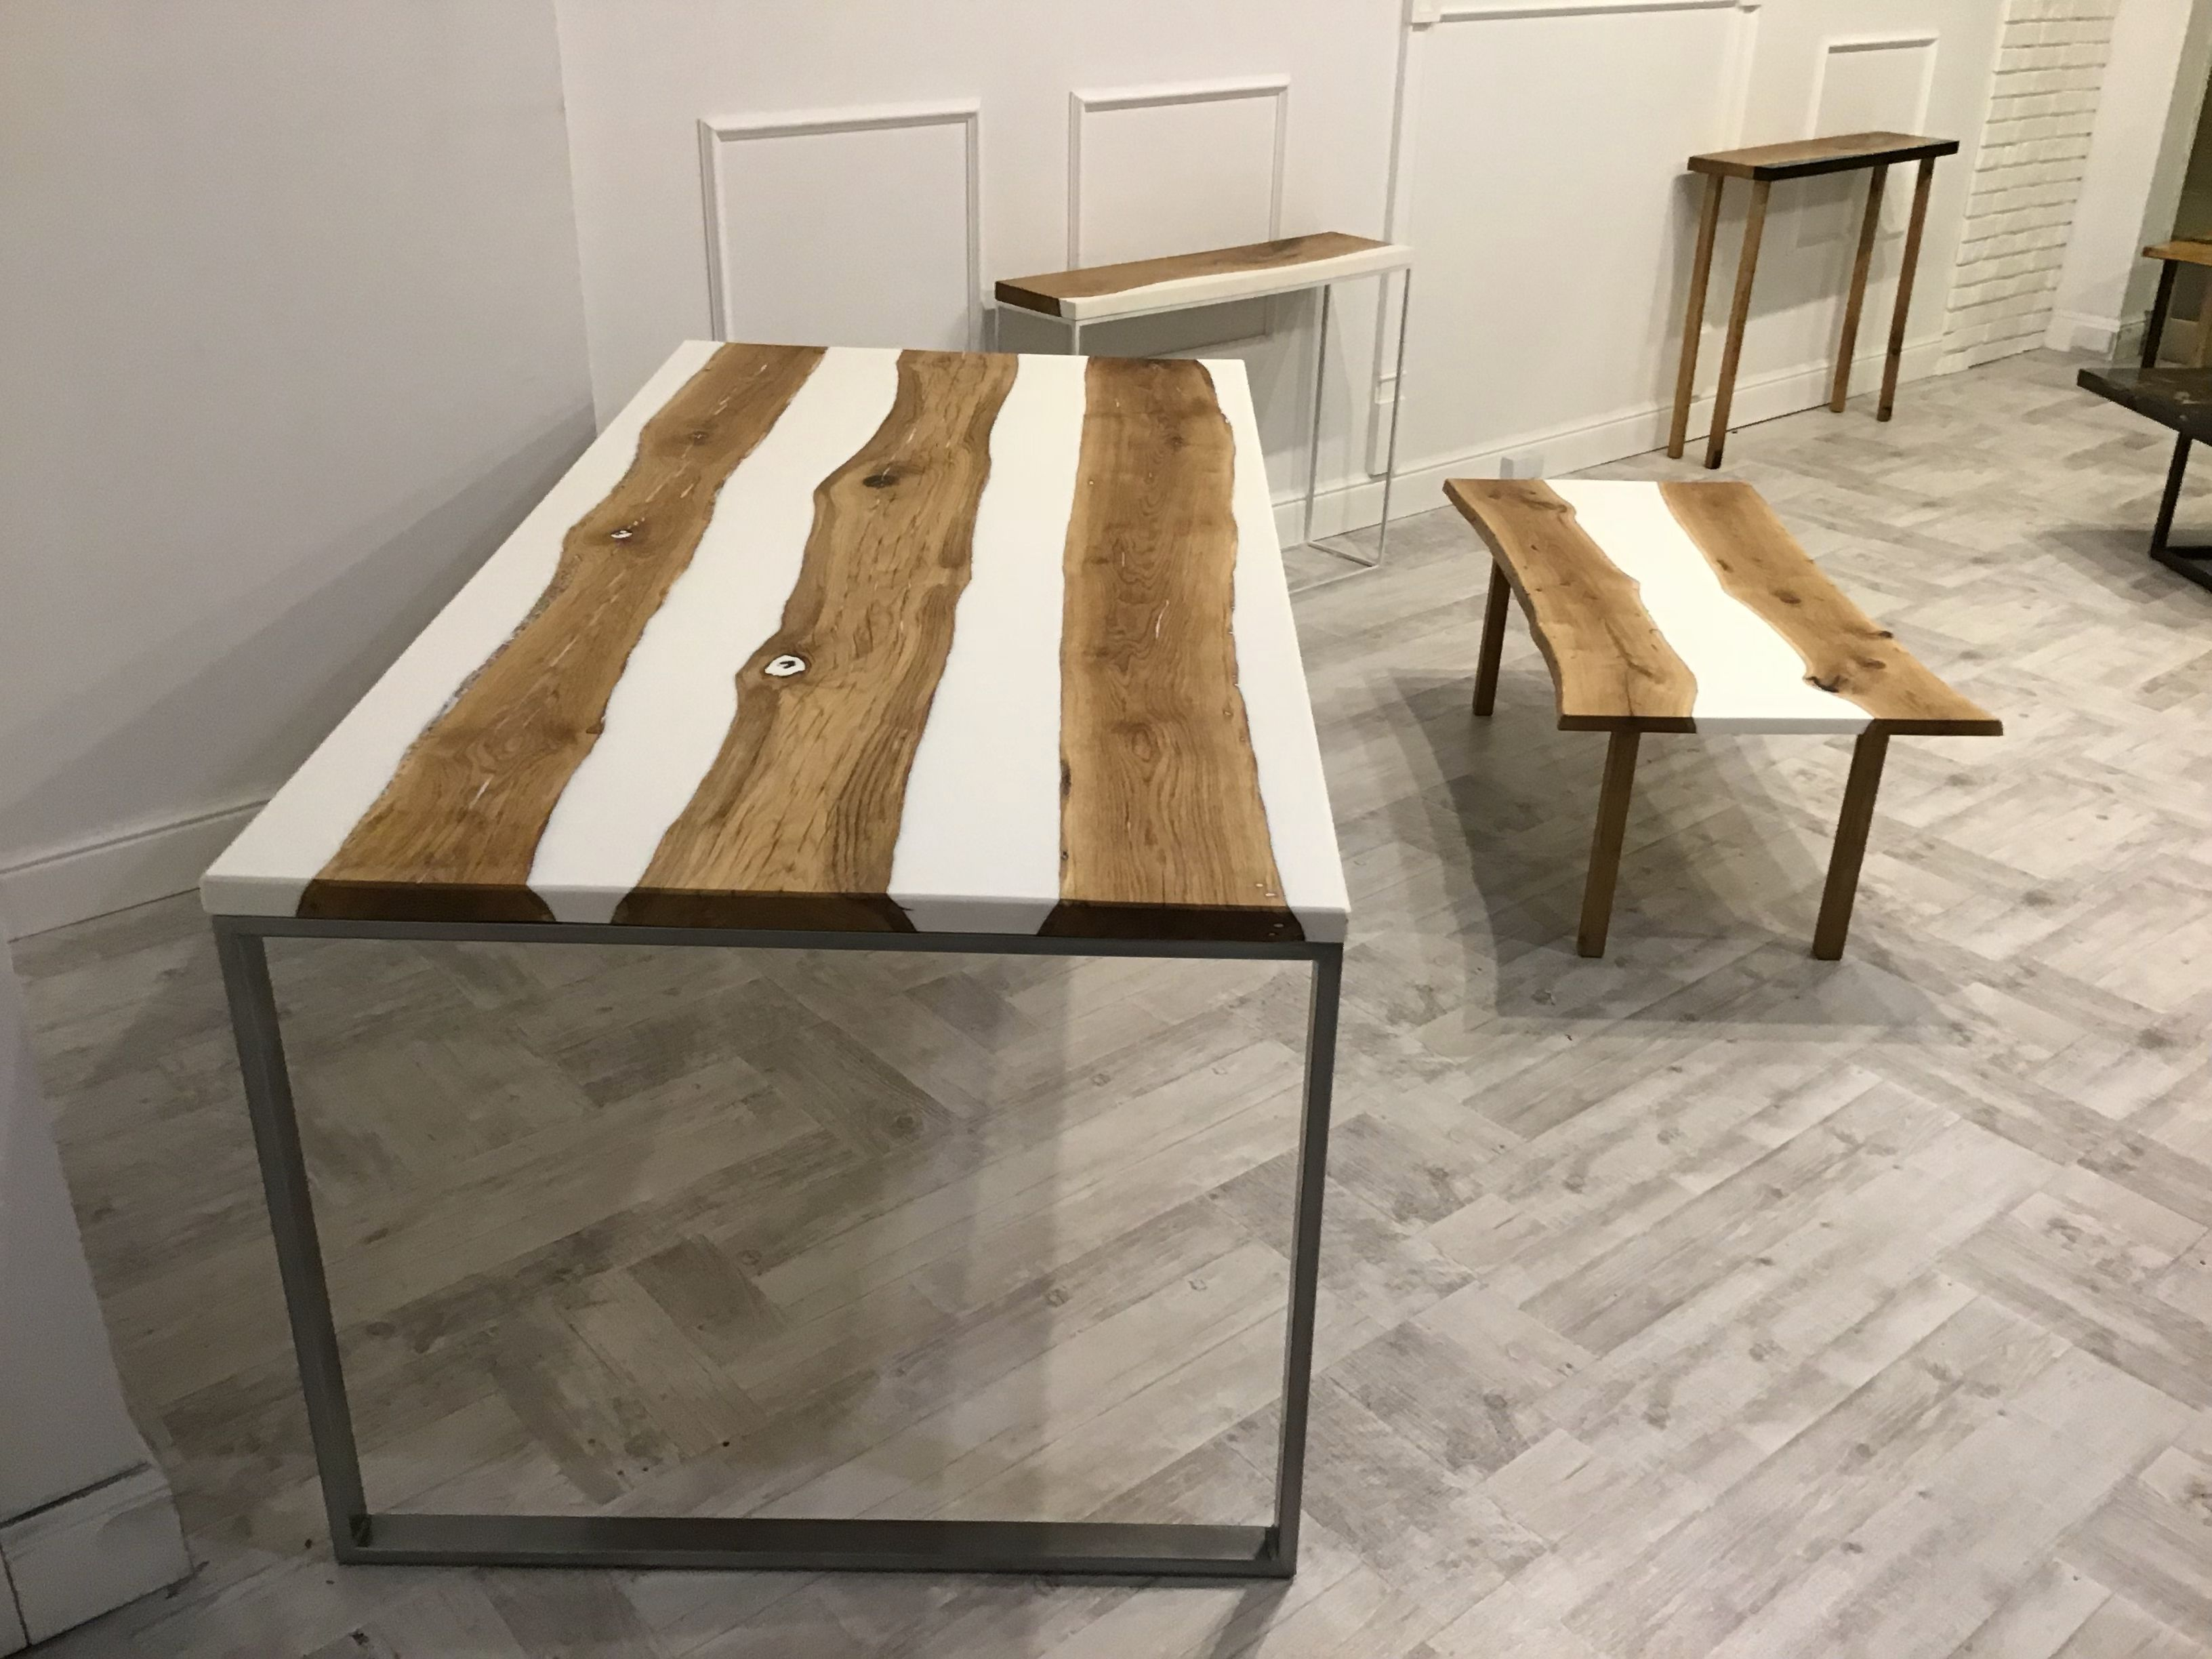 Resin Concept Wood Table Design White Oak Table Resin Furniture